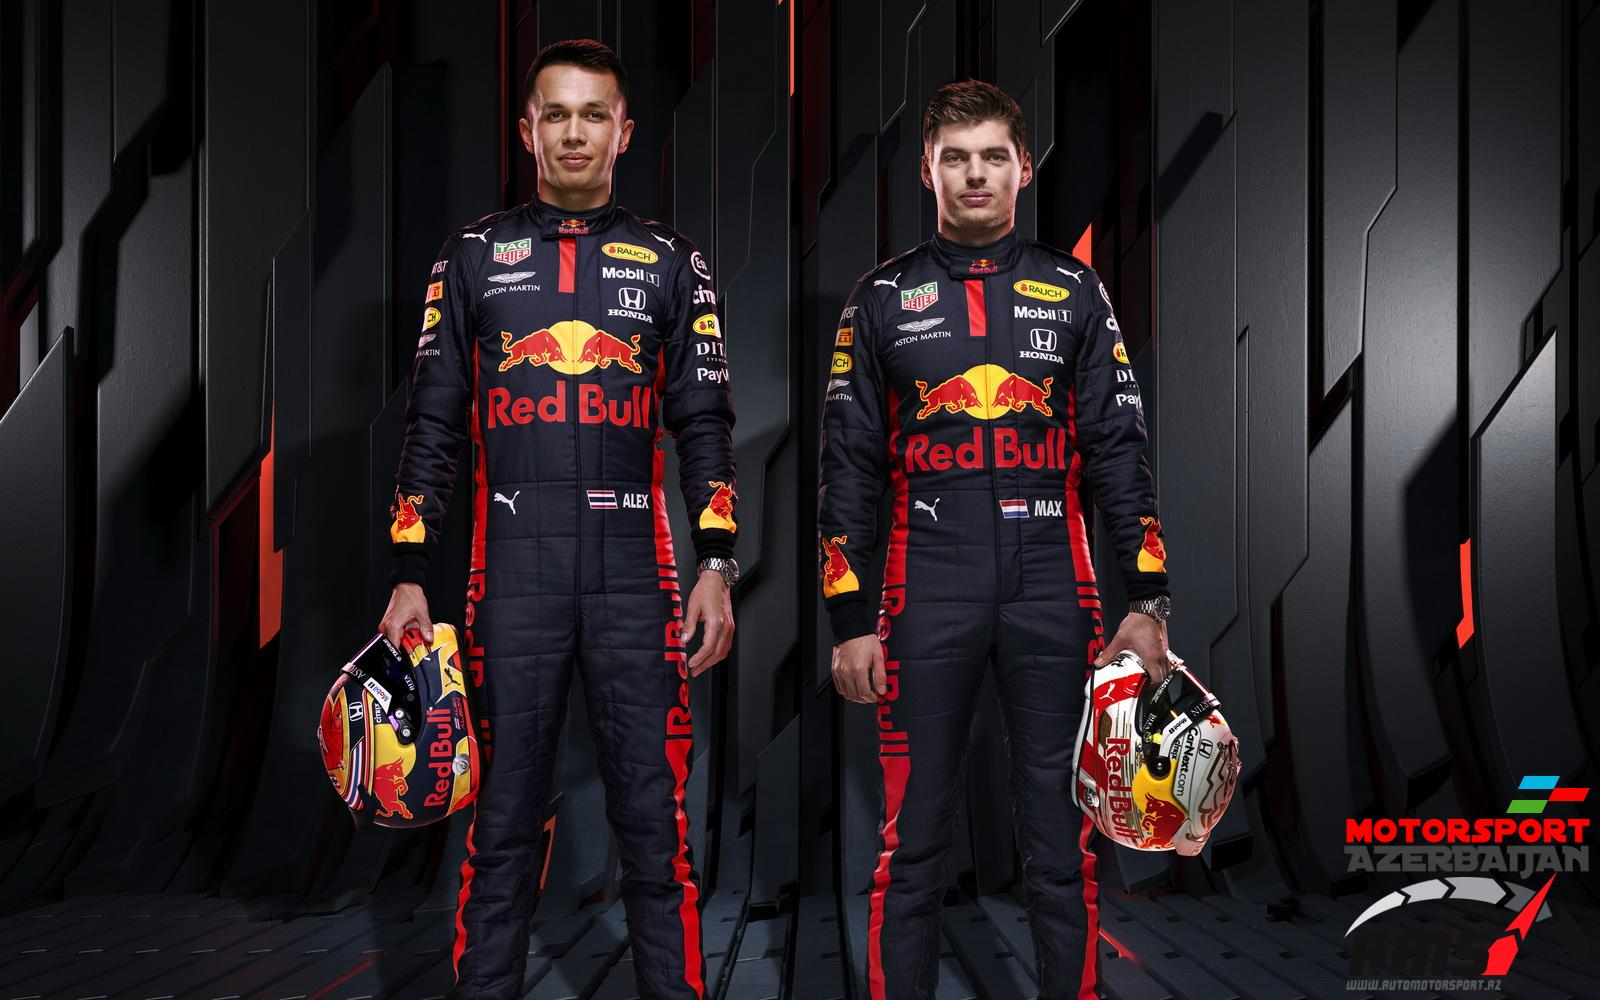 Alexander Albon, Max Verstappen